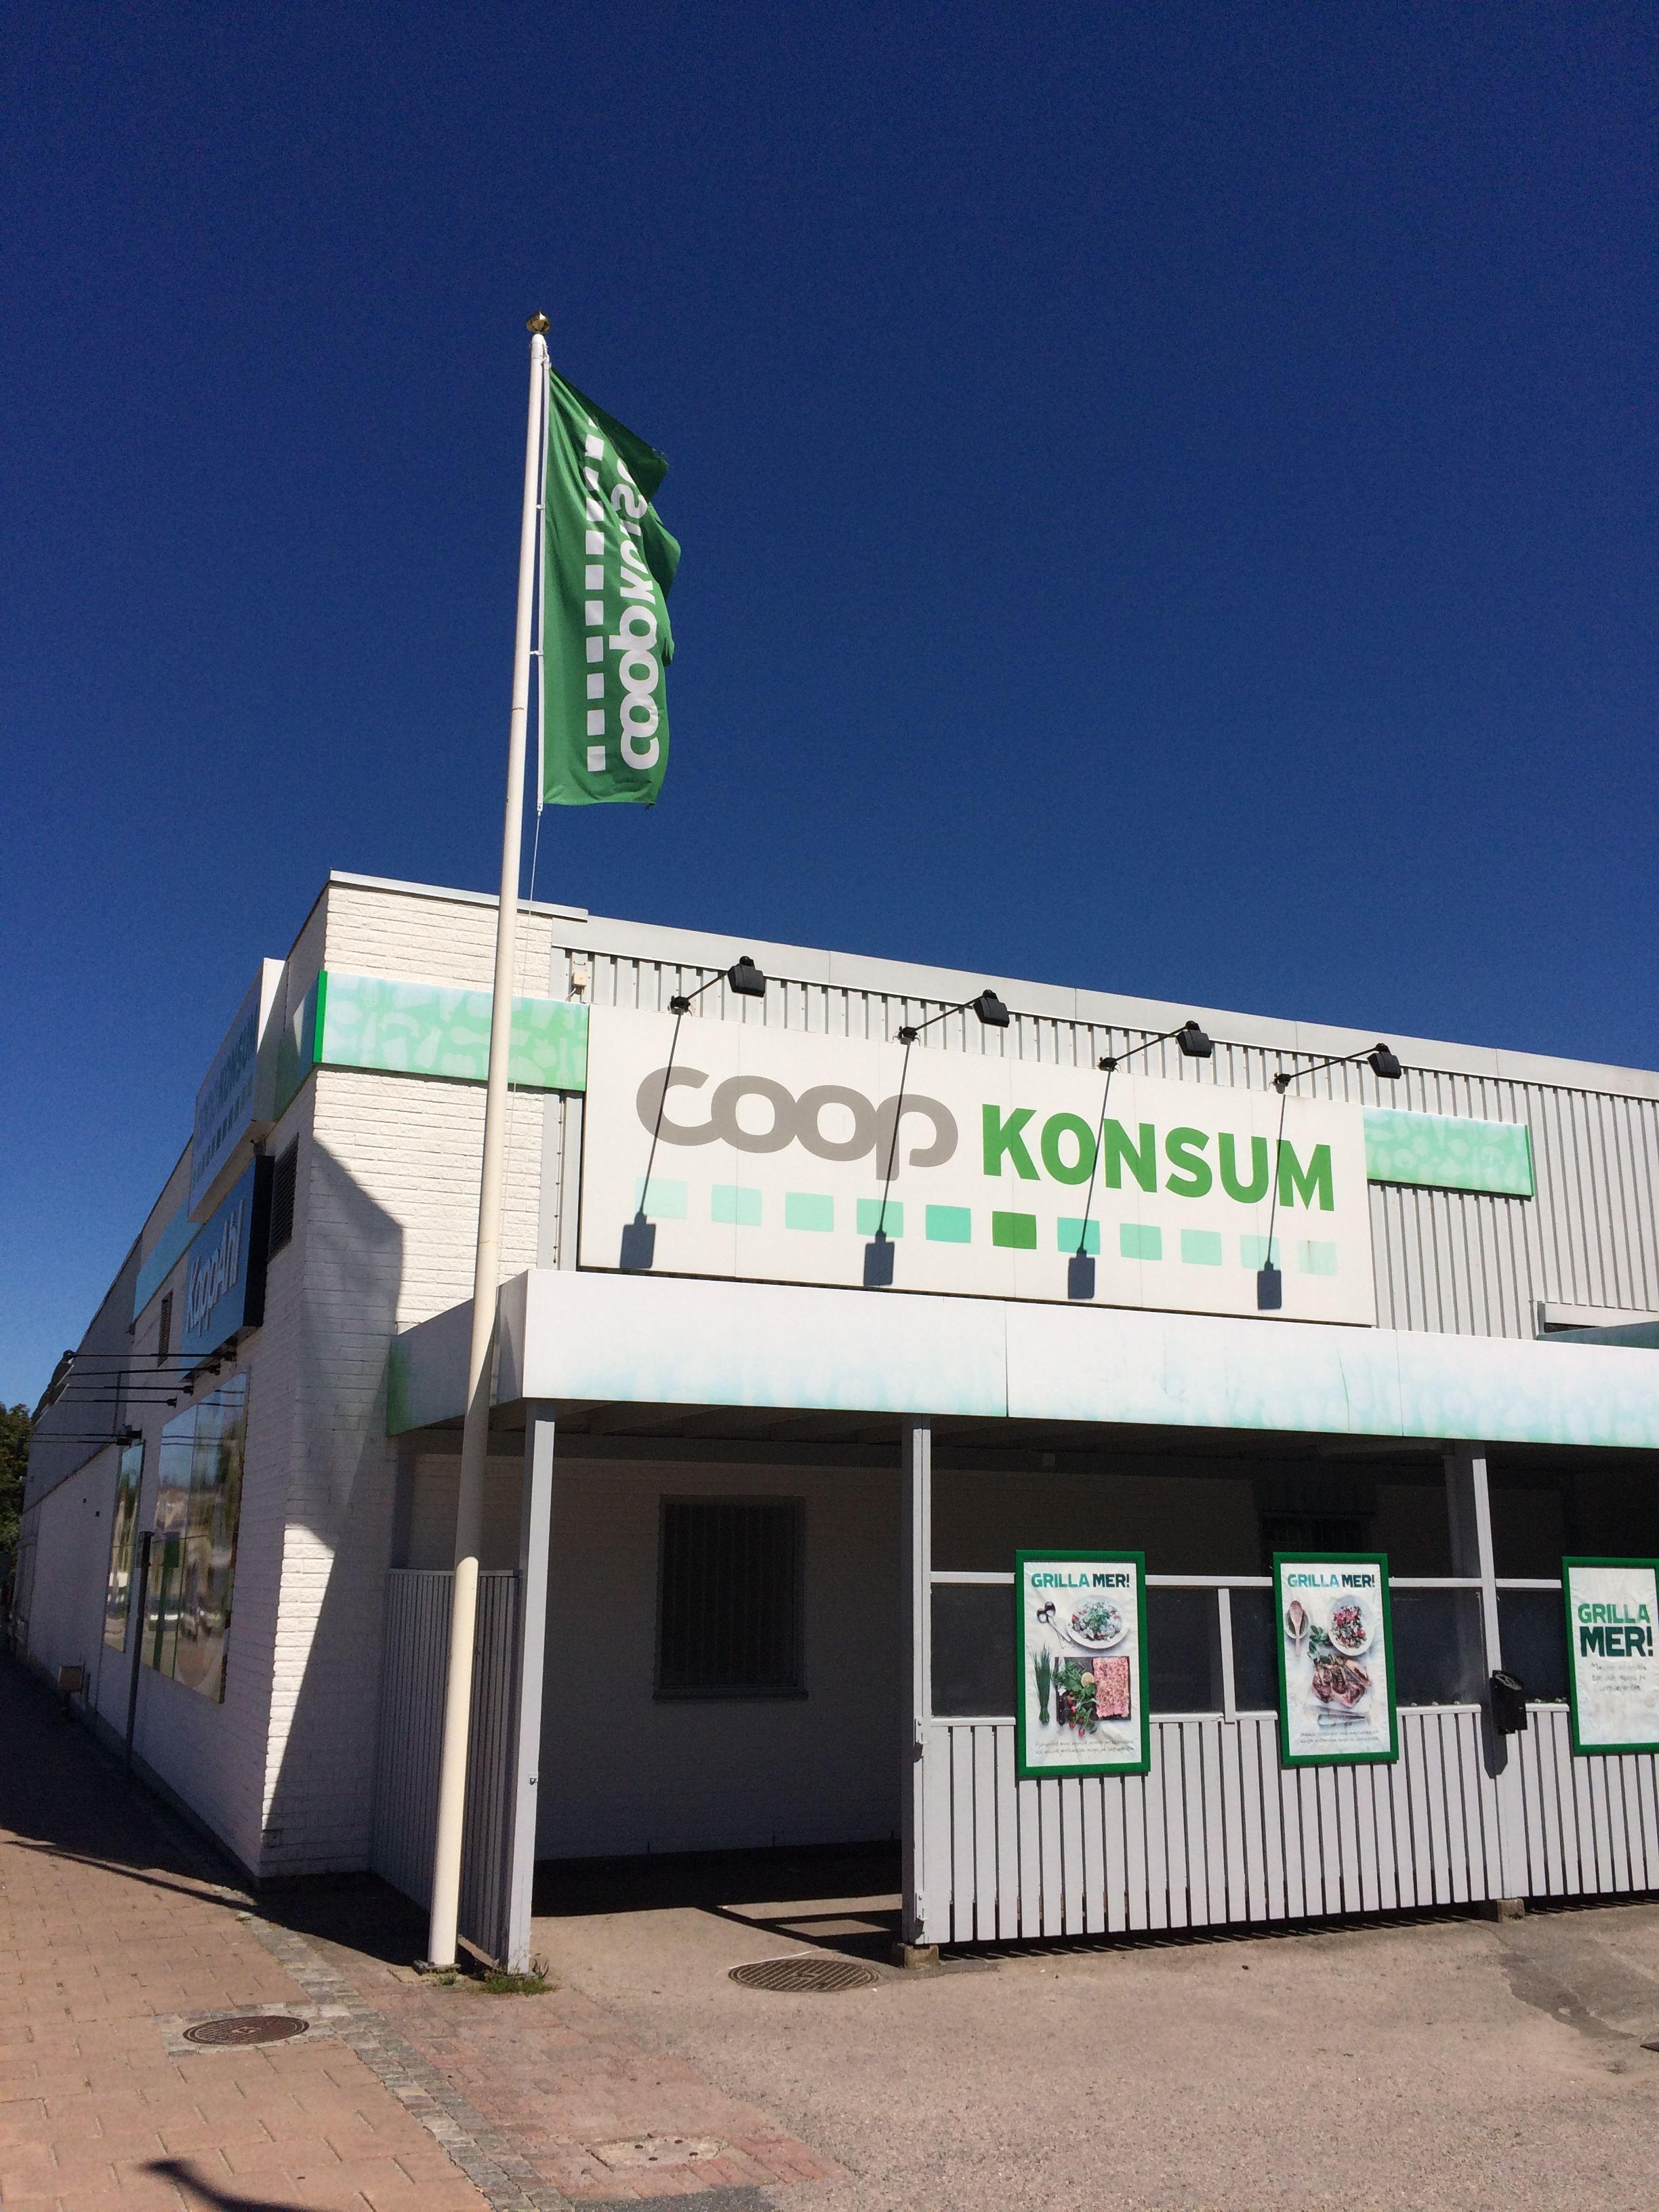 Coop Konsum (grocery store)